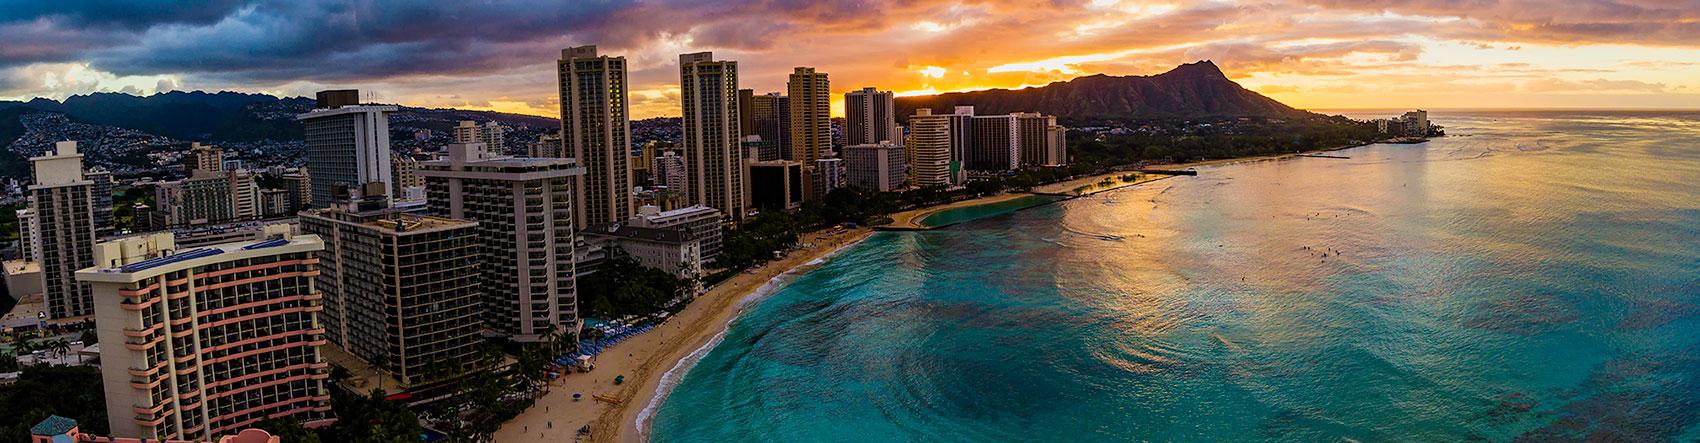 Hook up Oahu incontri MC Server 1,8